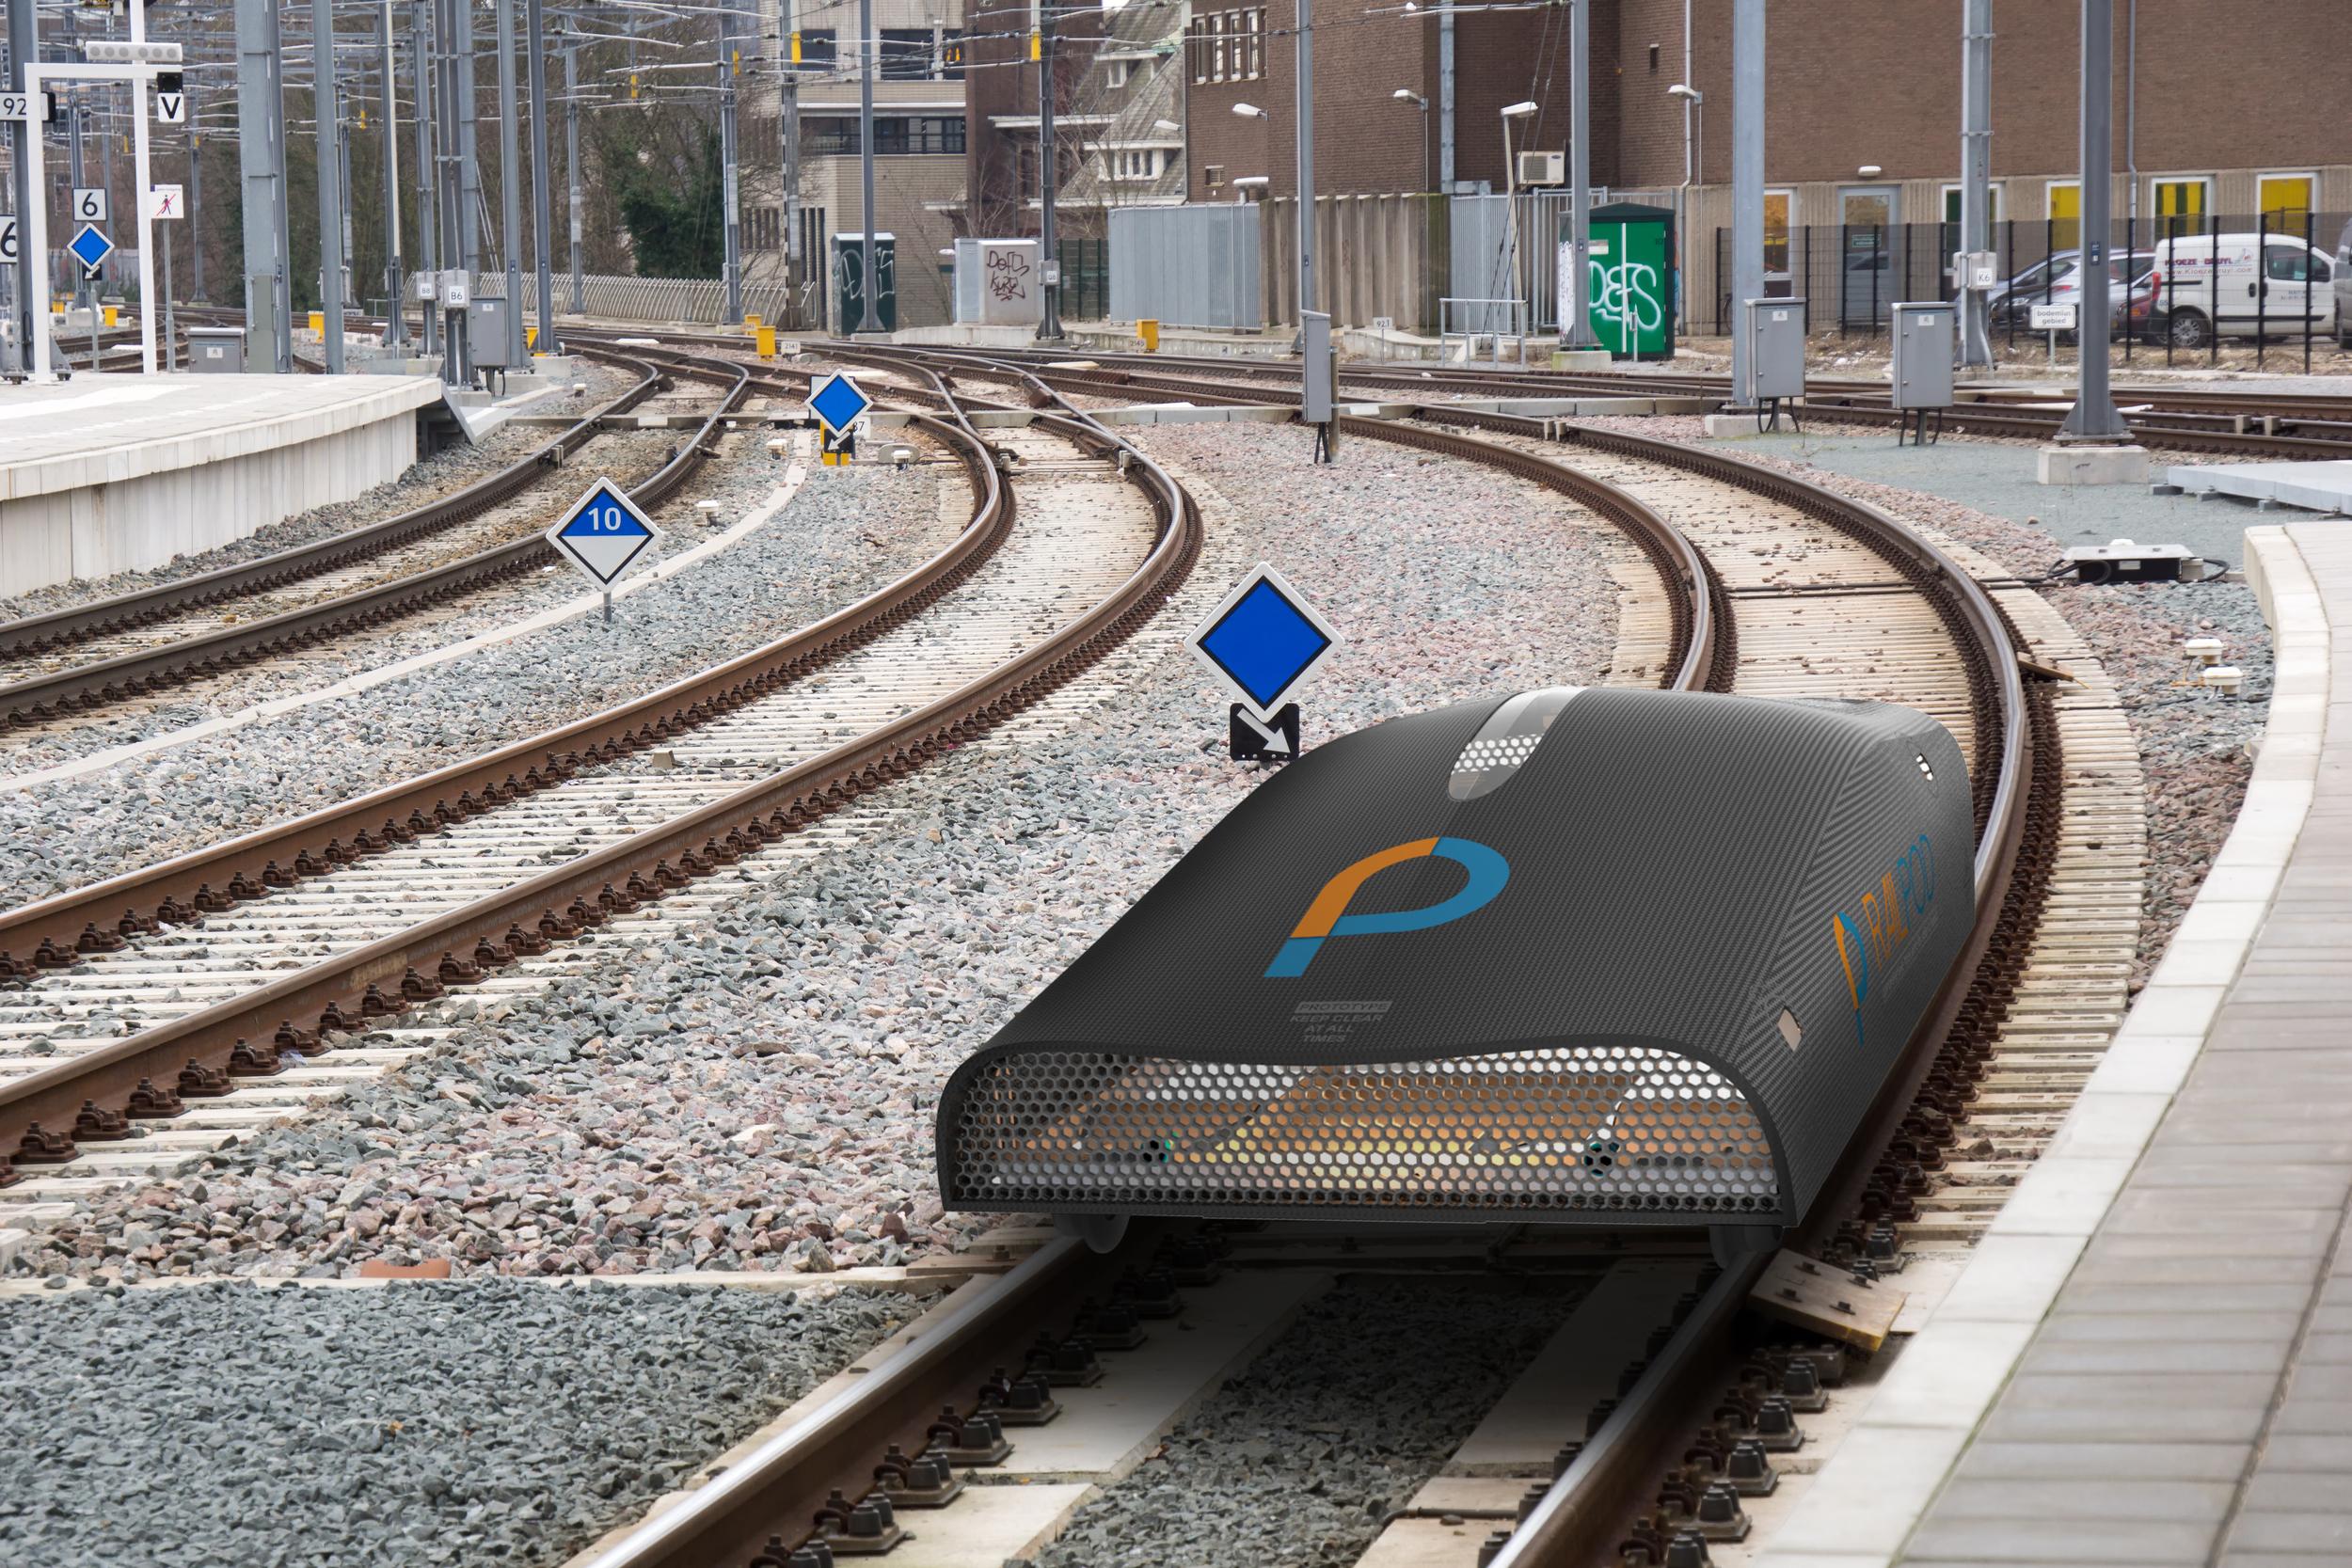 Railyard Composite JPG.jpg